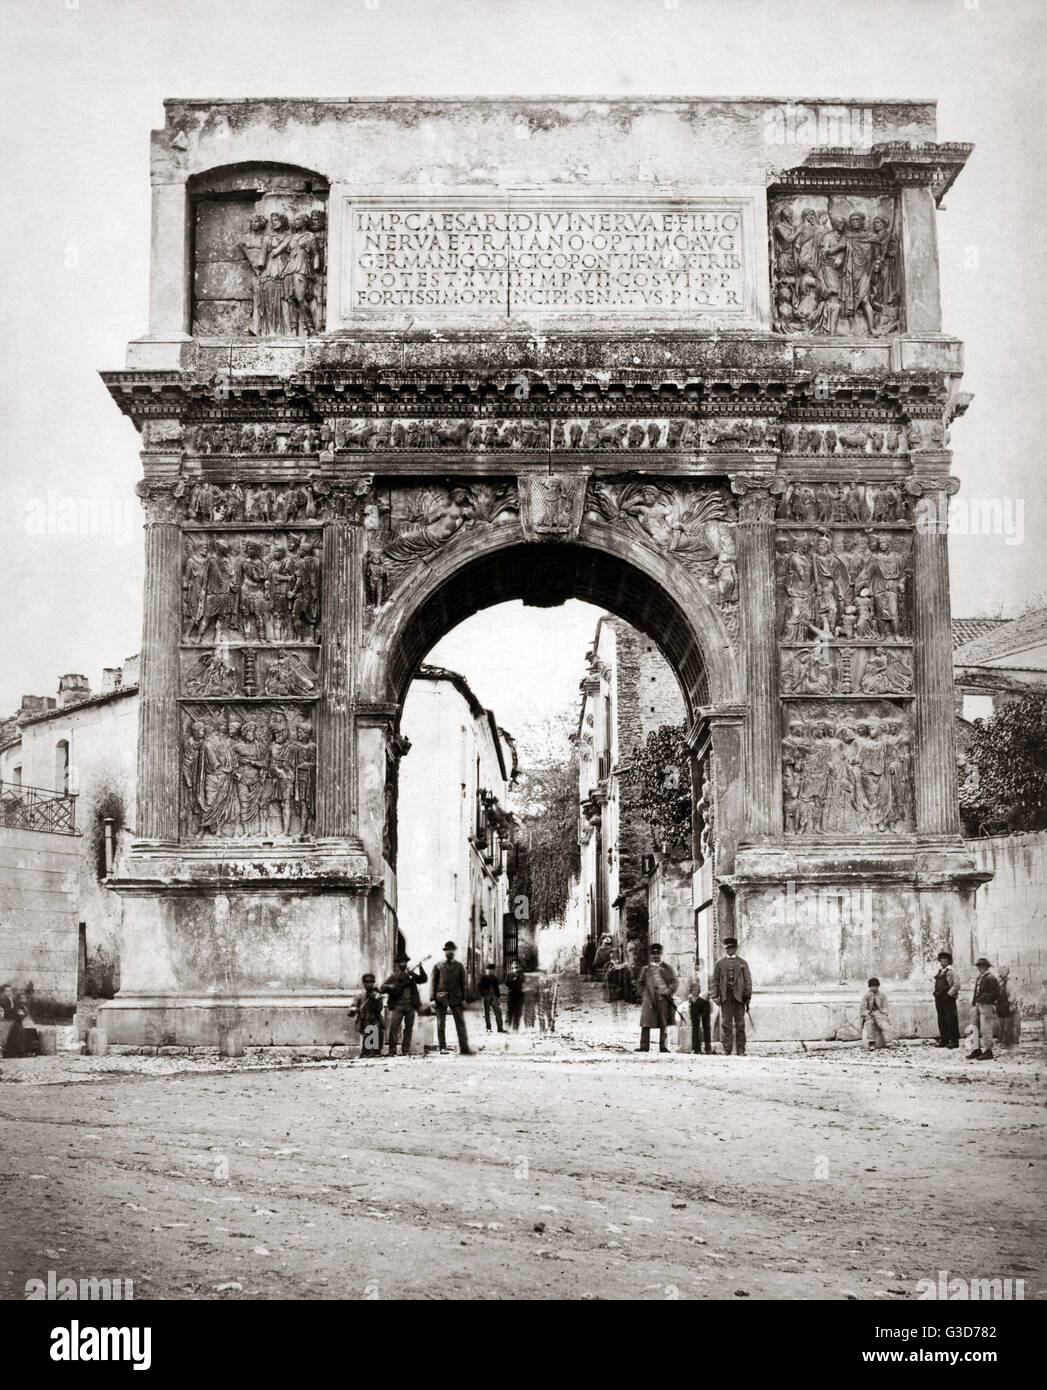 Der Trajansbogen, Benevento, in der Nähe von Neapel, Itlay, ca. 1870 s.     Datum: ca. 1870 s Stockbild